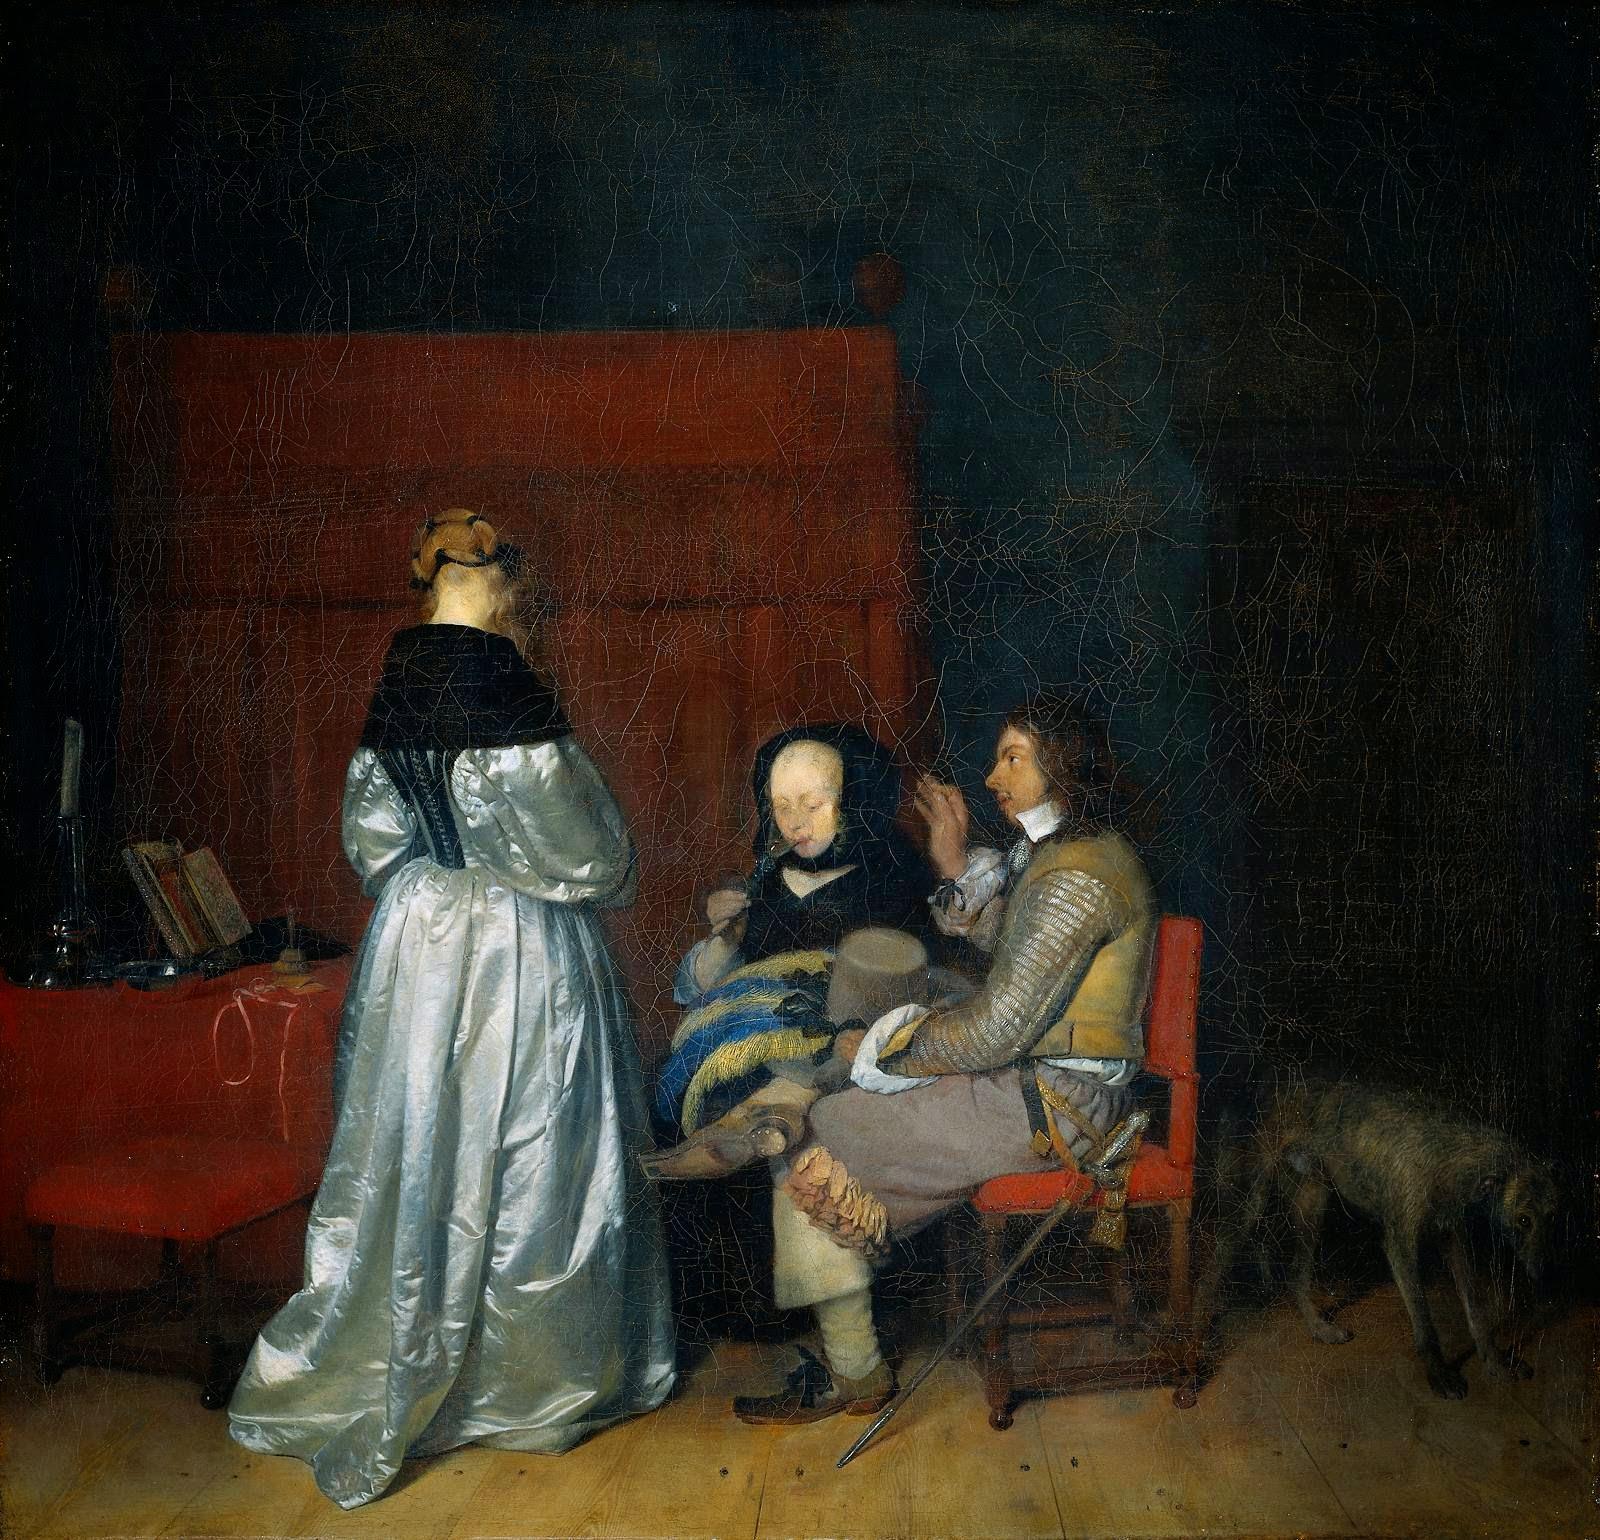 Gerard ter Borch o Gerard Terborch - Conversación galante - Amonestación paterna